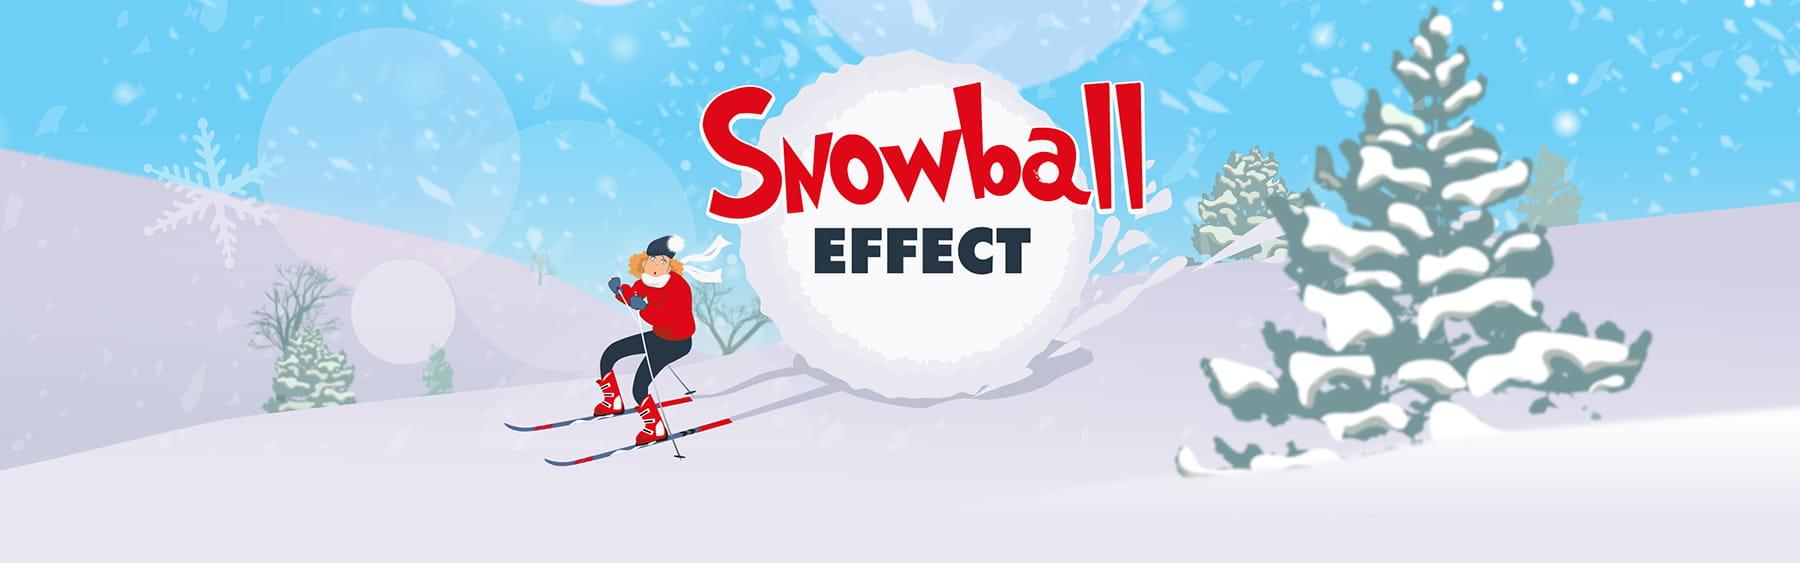 """Snowball"